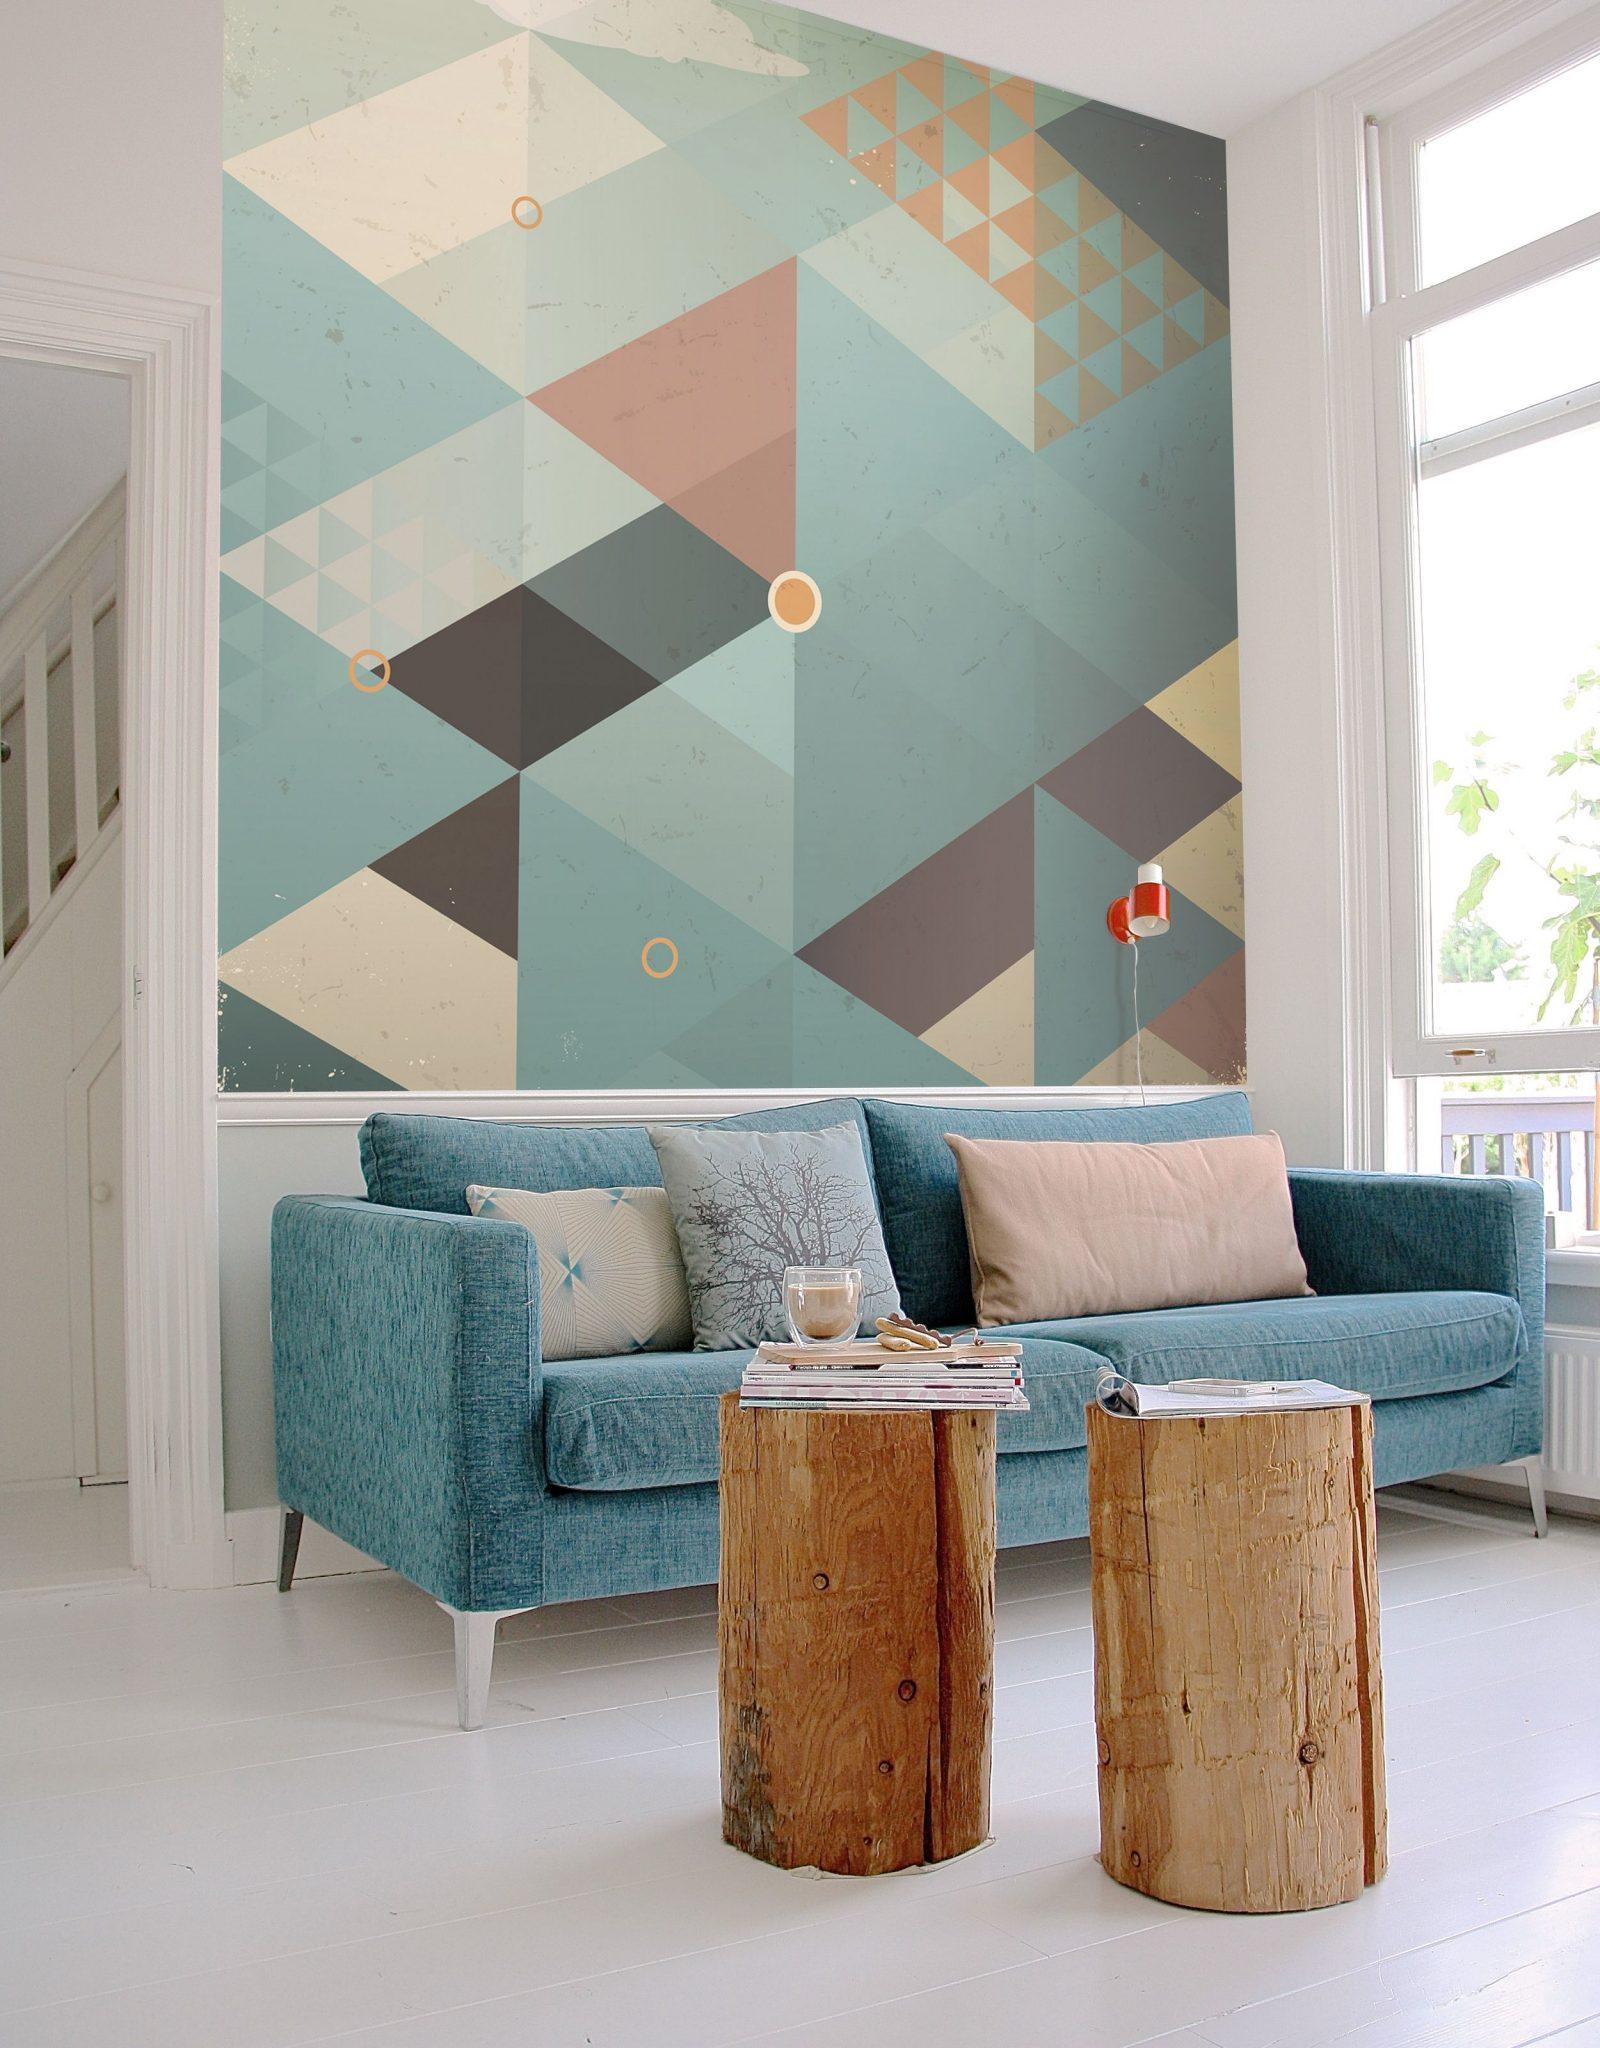 Background Warna Warni Untuk Menghidupkan Suasana Rumah